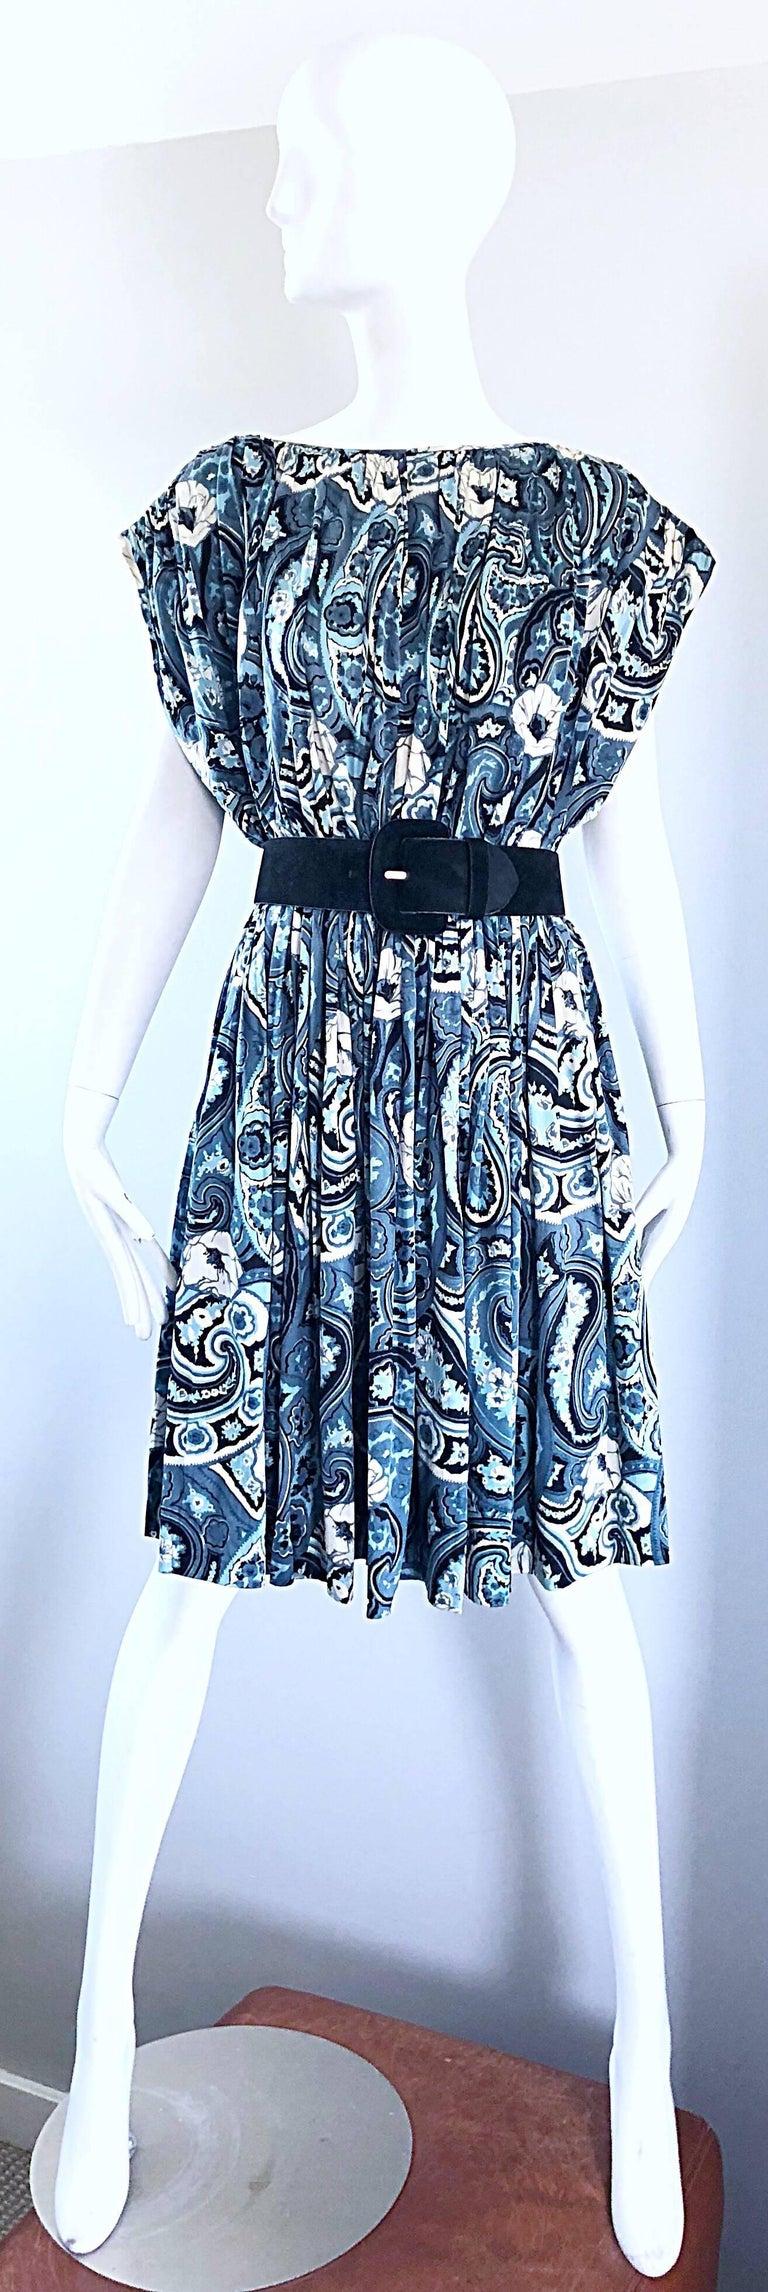 Rare 1950s Townley Blue + White Paisley Flower Print Vintage 50s Dress For Sale 5